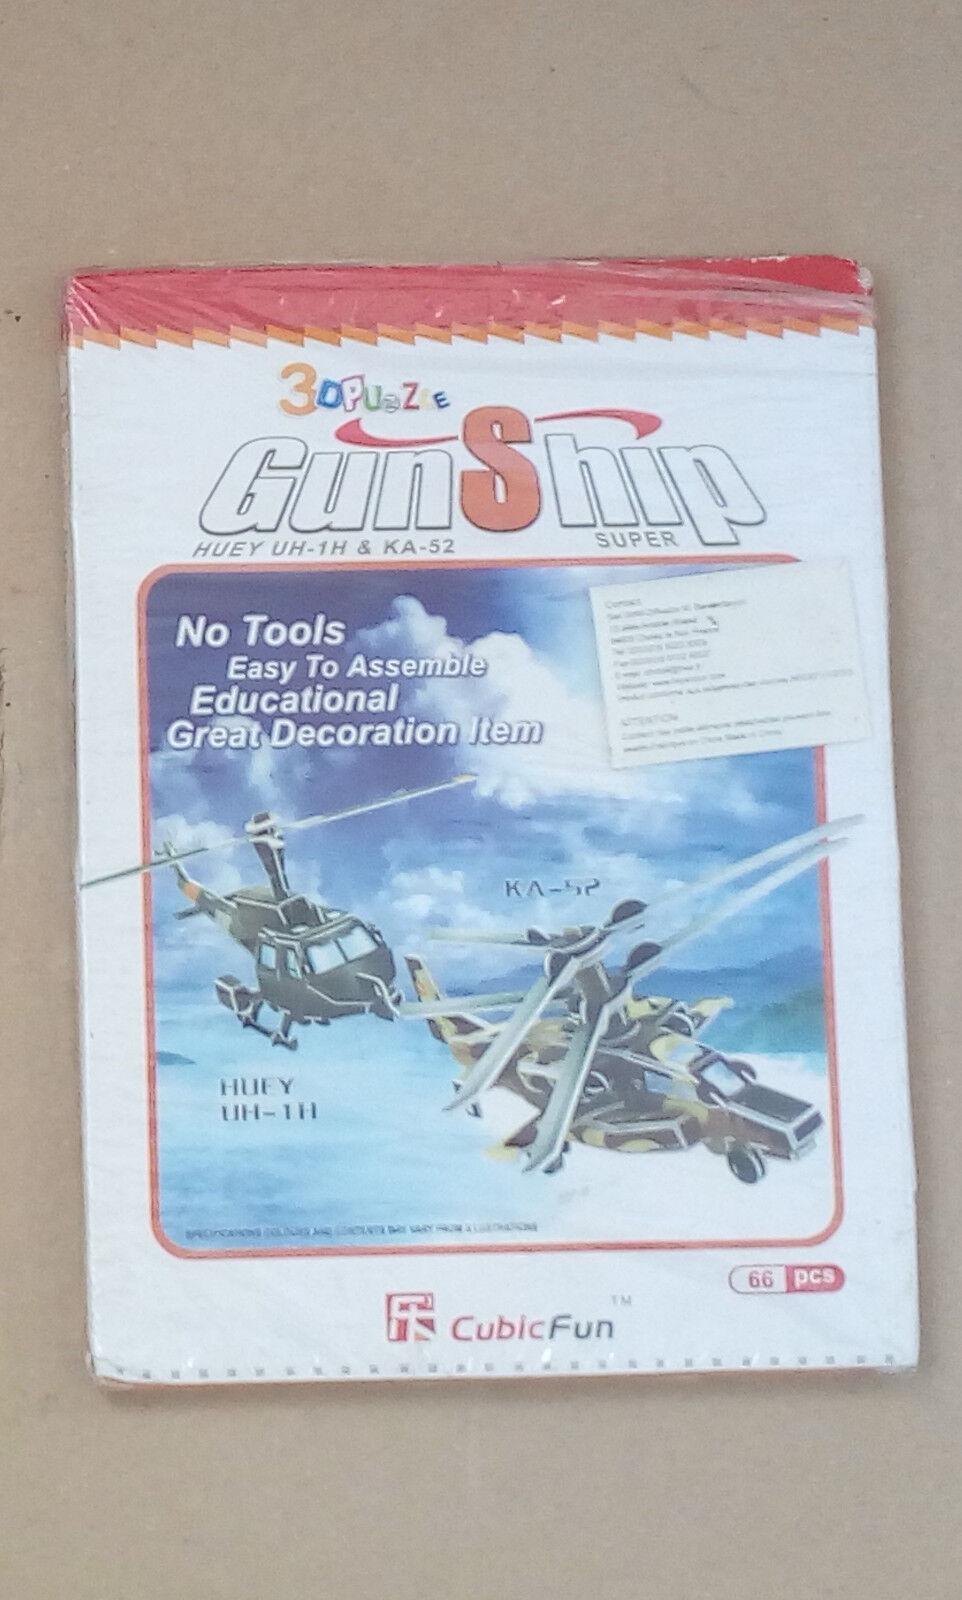 3D PUZZLE 2 élécopter us huey UH-1H & KA52